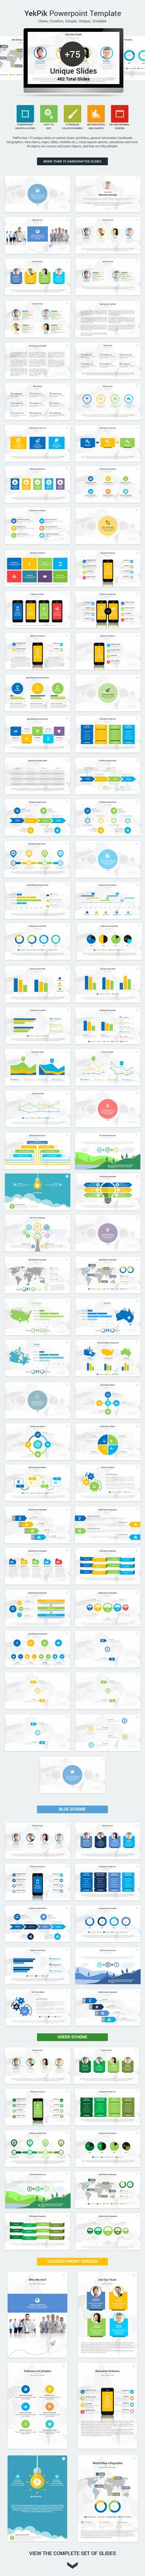 YekPix PowerPoint Presentation Template (Powerpoint Templates)